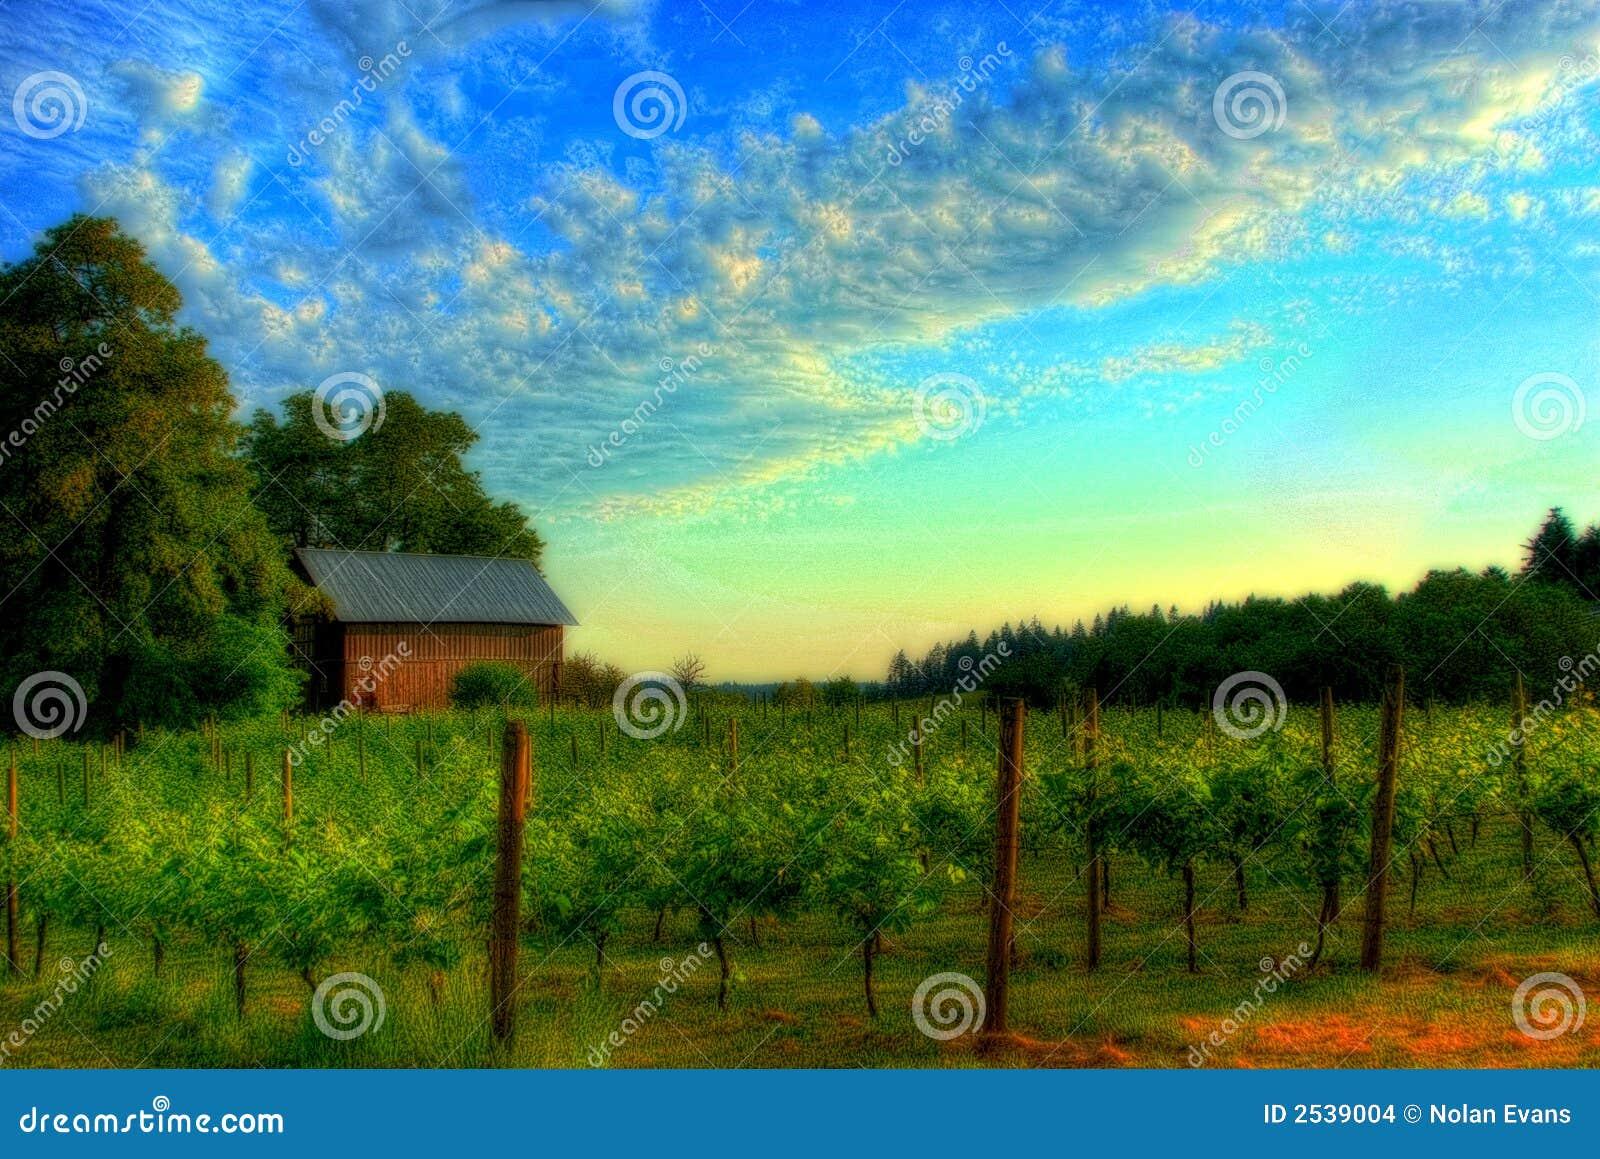 Horizontal de vigne